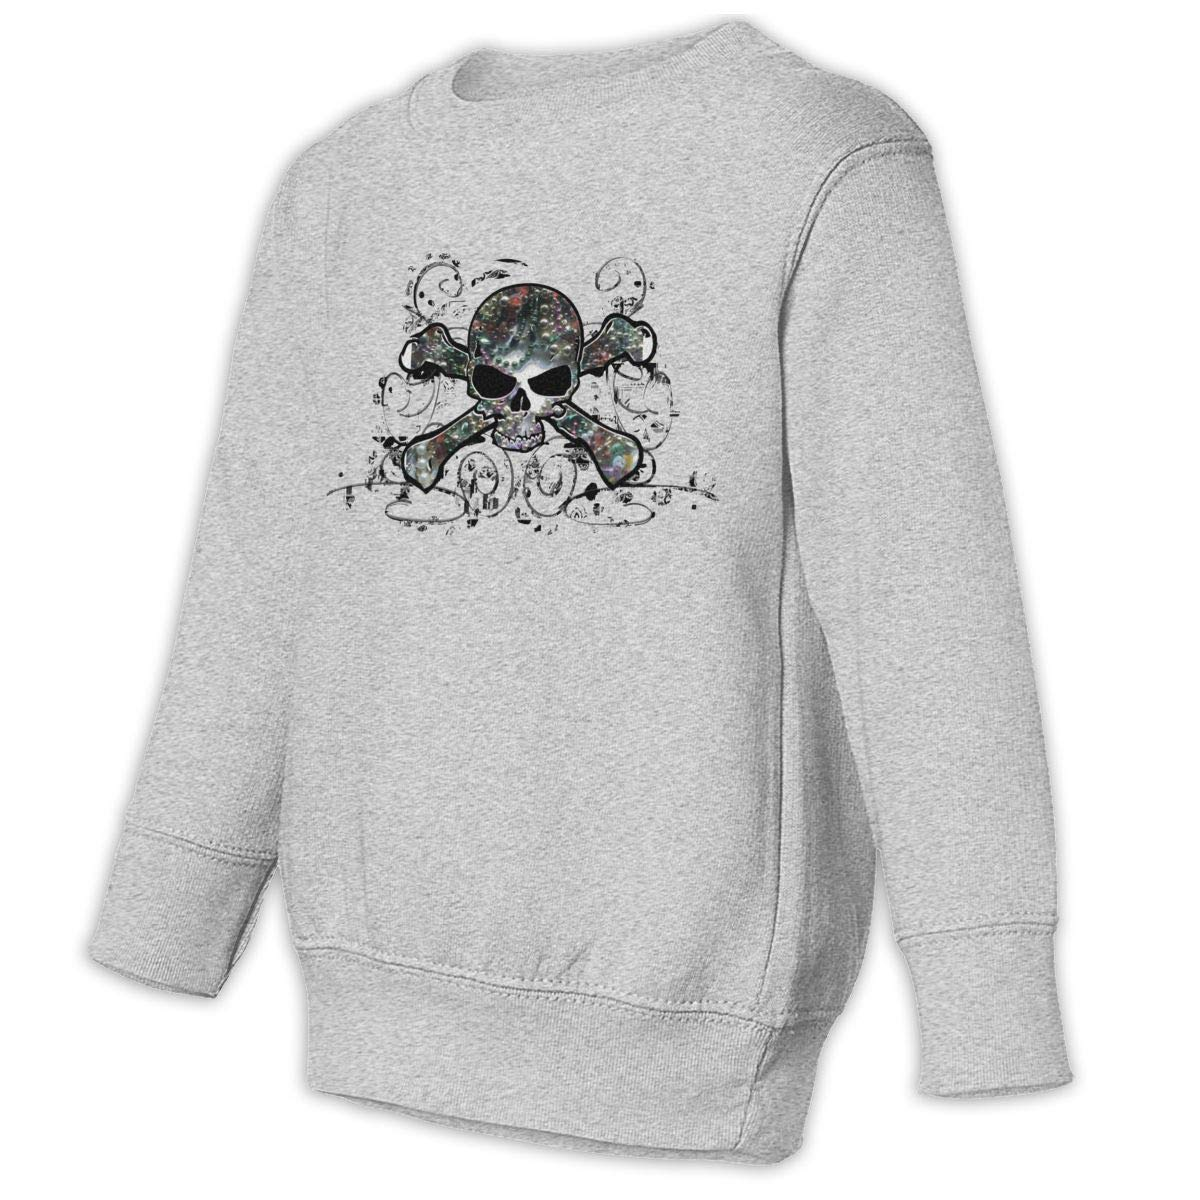 Yuliang Skull /& Crossbones Mardi Gras Children Leisure Sweater Gray